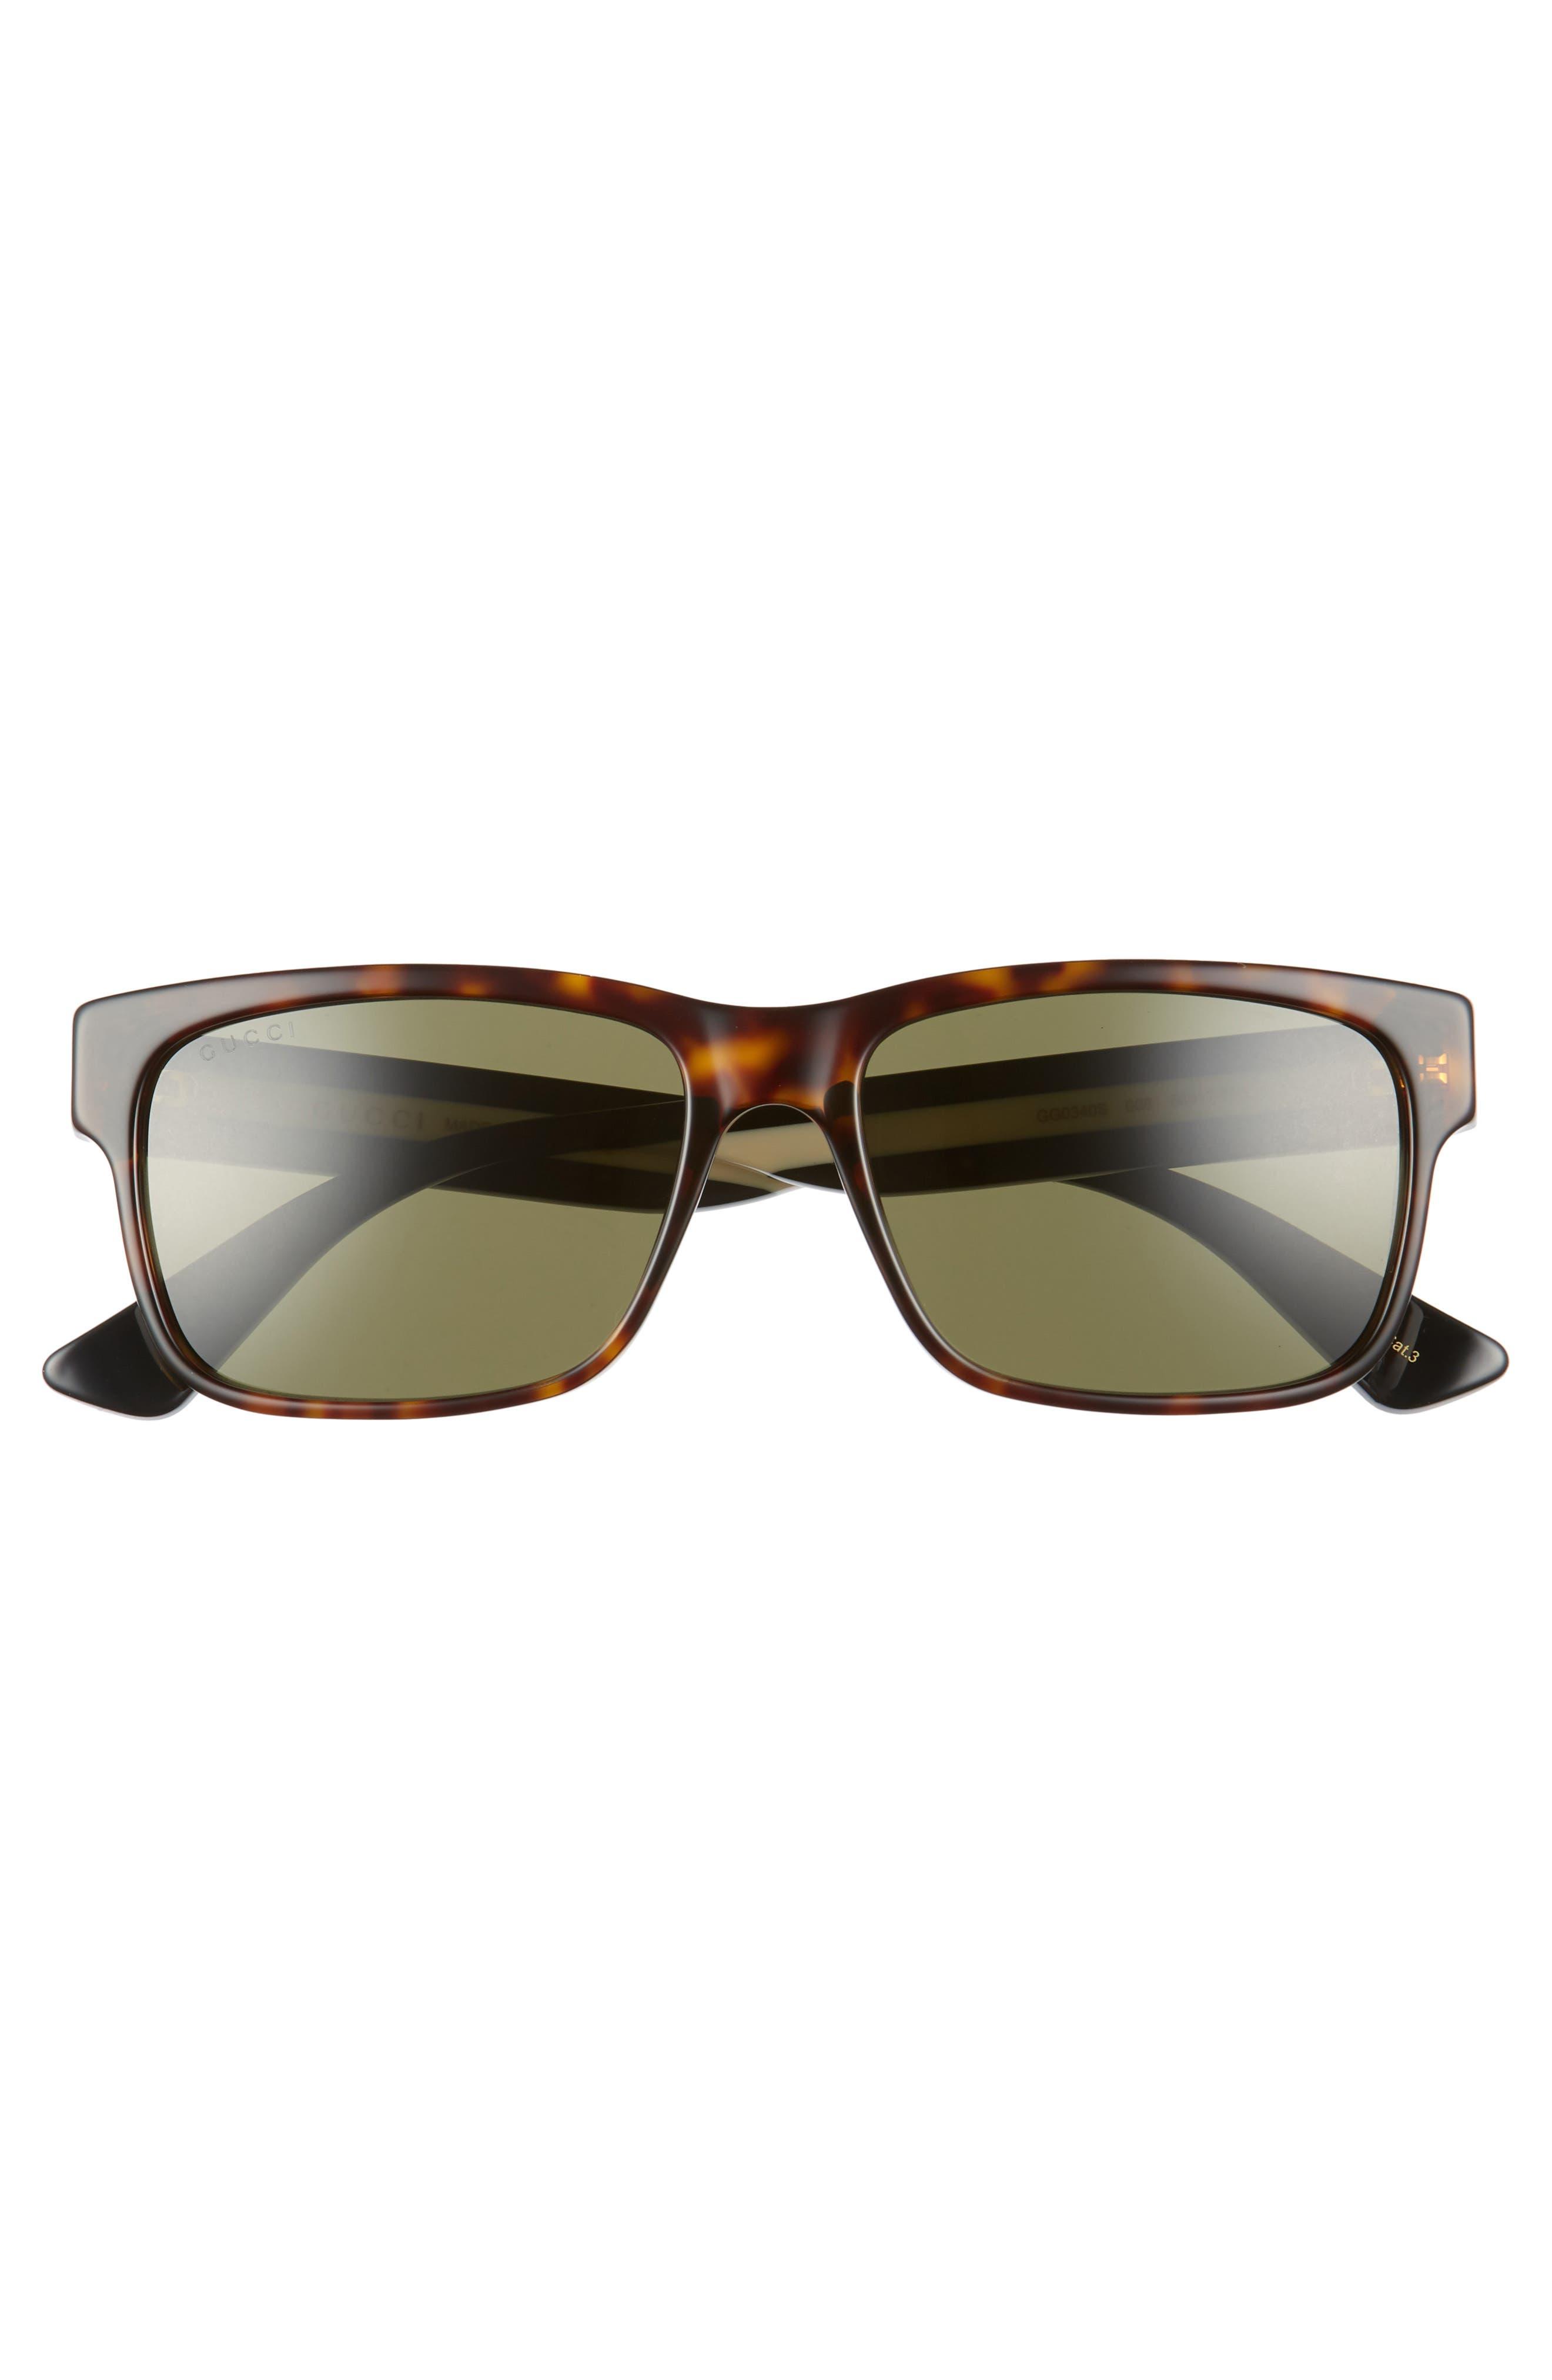 GUCCI, Sylvie 58mm Sunglasses, Alternate thumbnail 2, color, BLACK MULTICOLOR